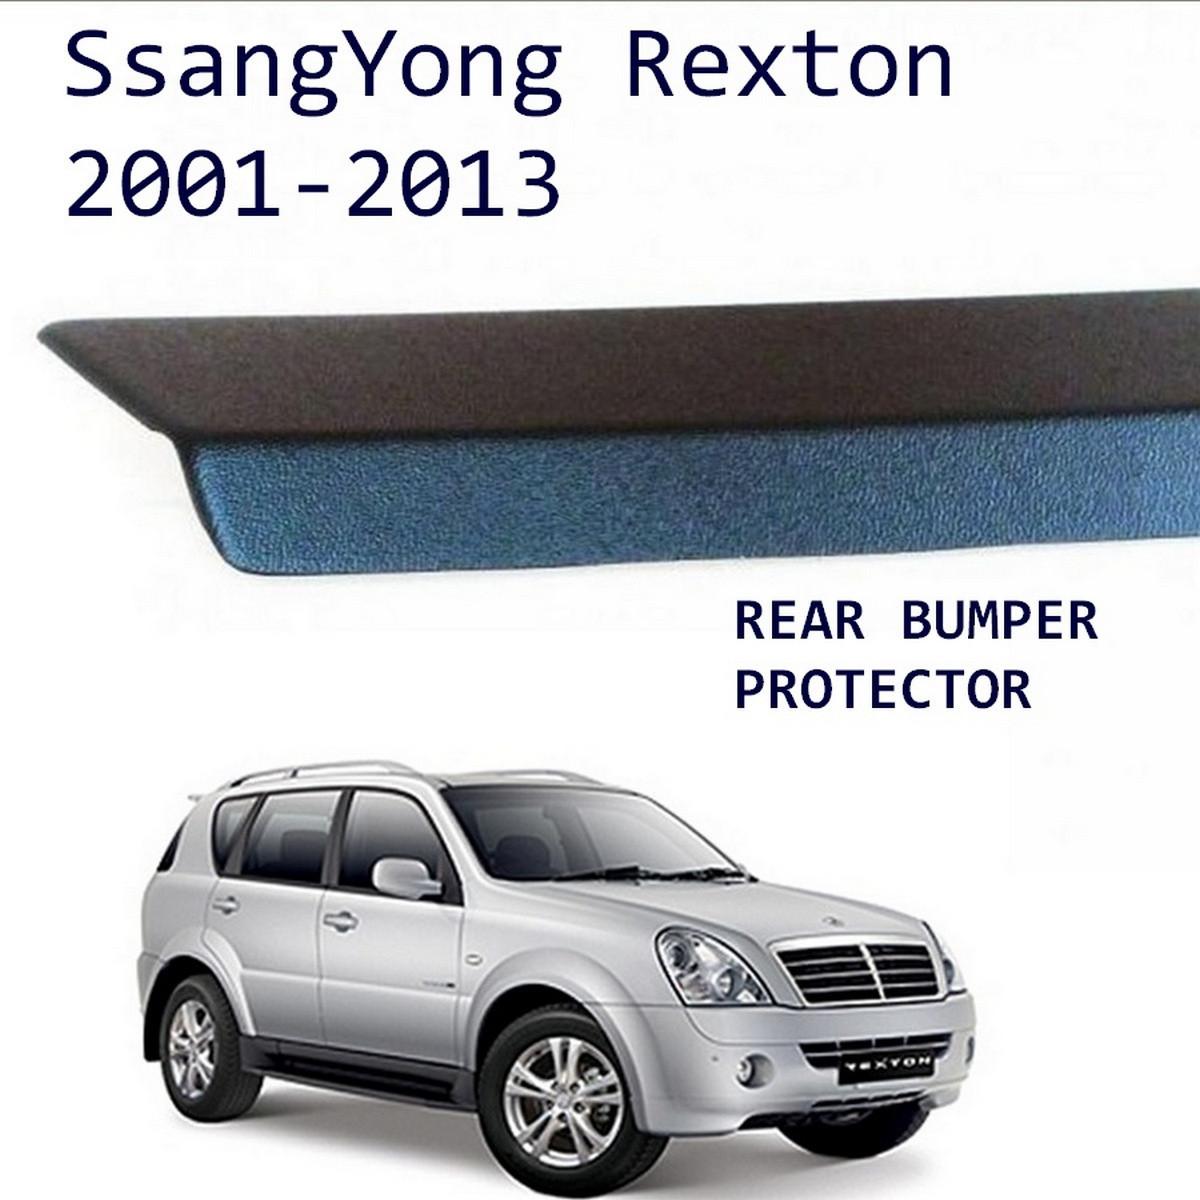 SsangYong Rexton I,II 2001-2013 пластиковая защитная накладка заднего бампера